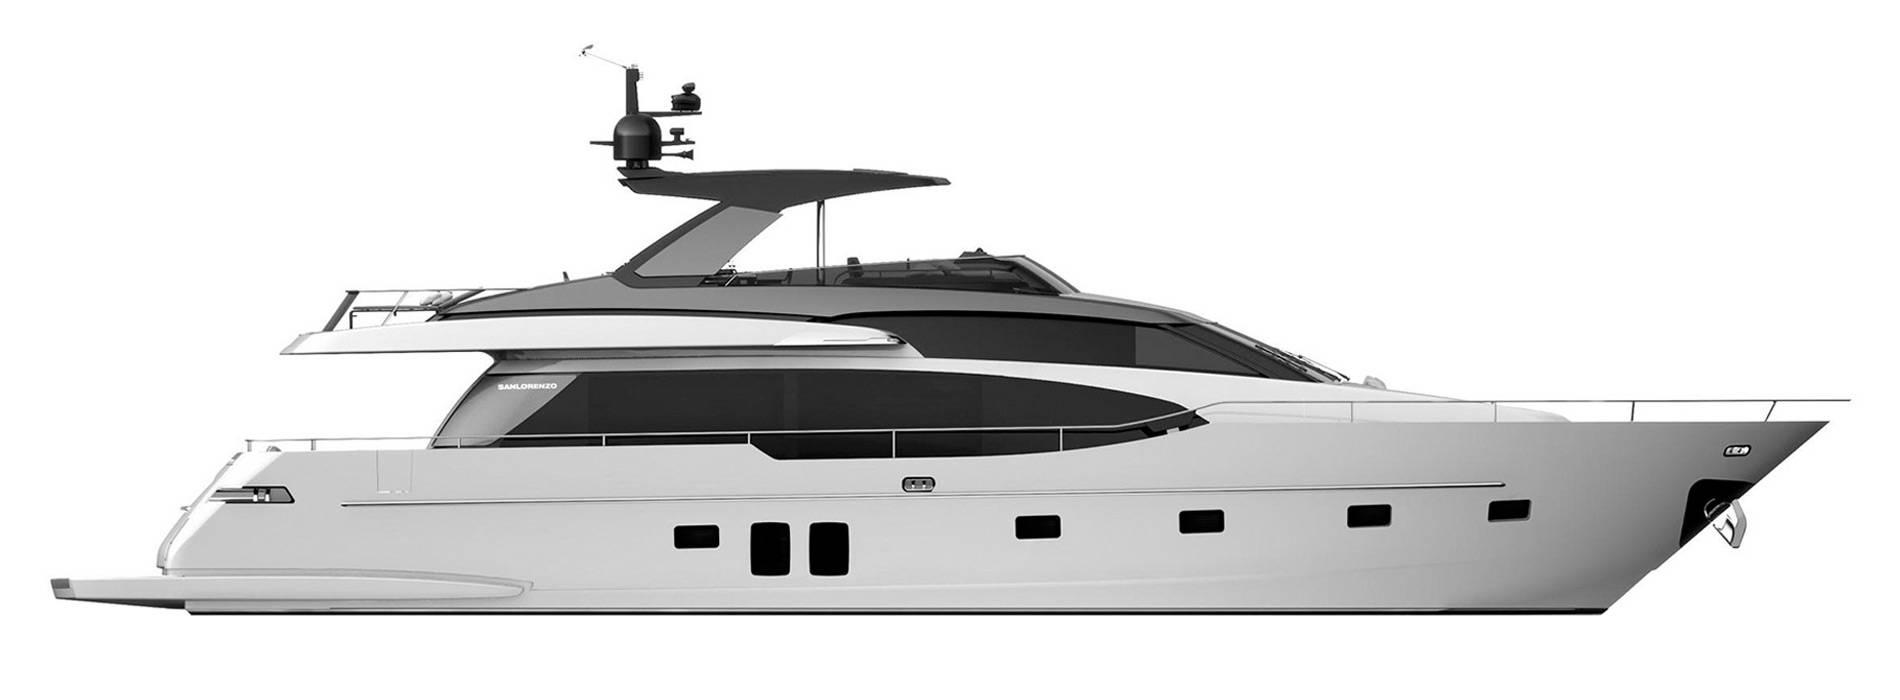 Sanlorenzo Yachts SL78 Perfil